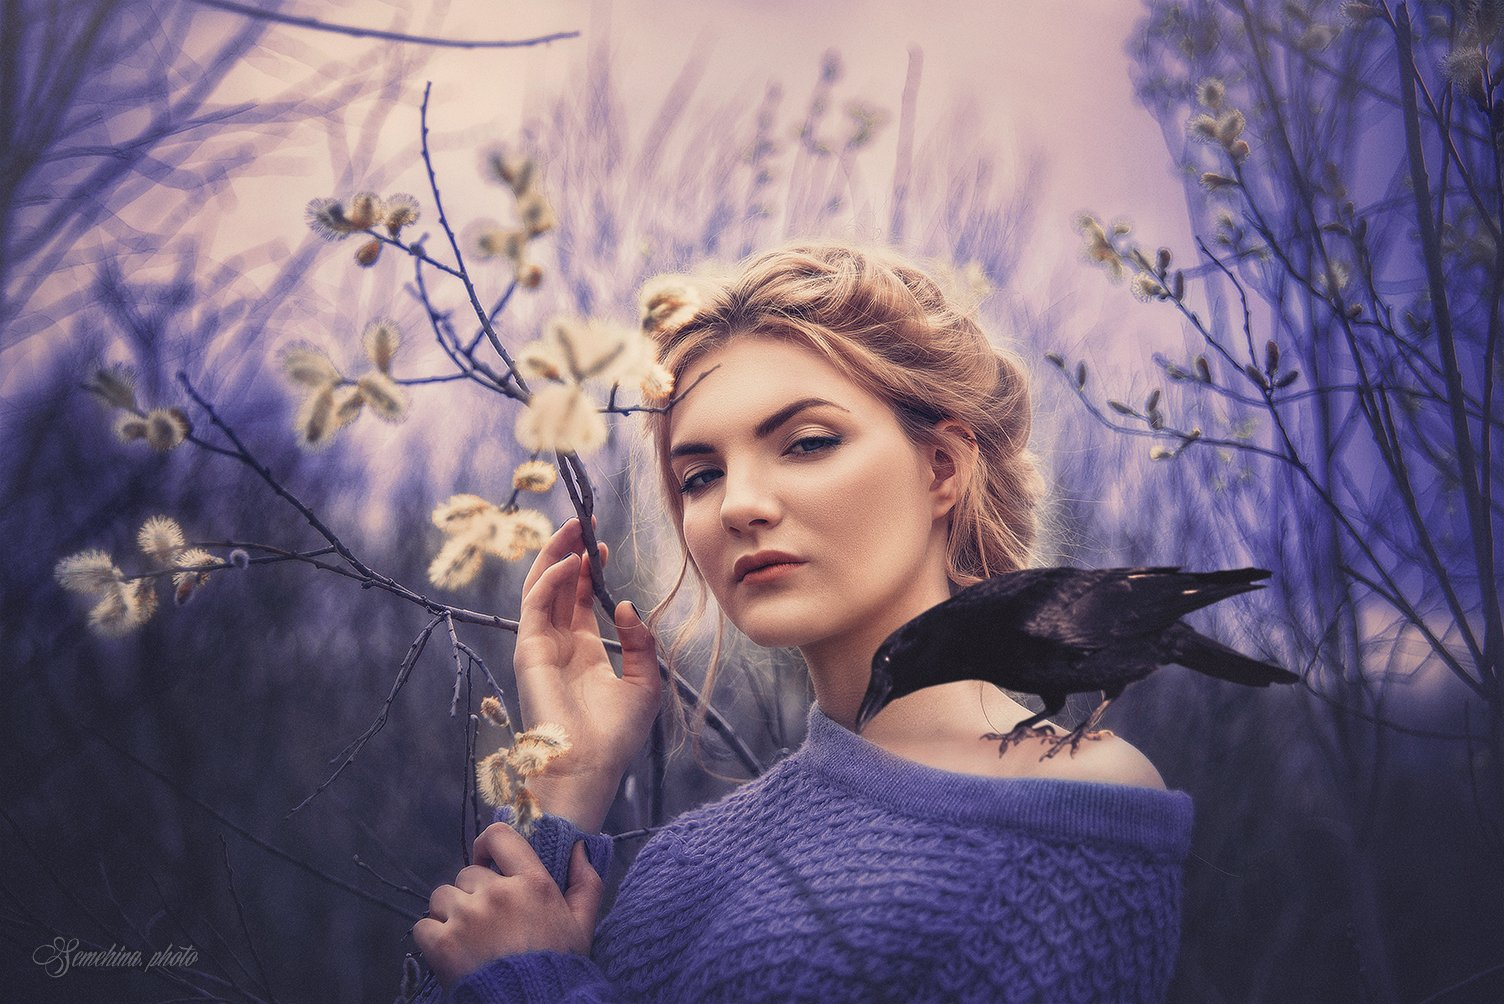 девушка, ворон, птица, верба, весна, драма, girl, drama, bird, spring, Марина Семёхина